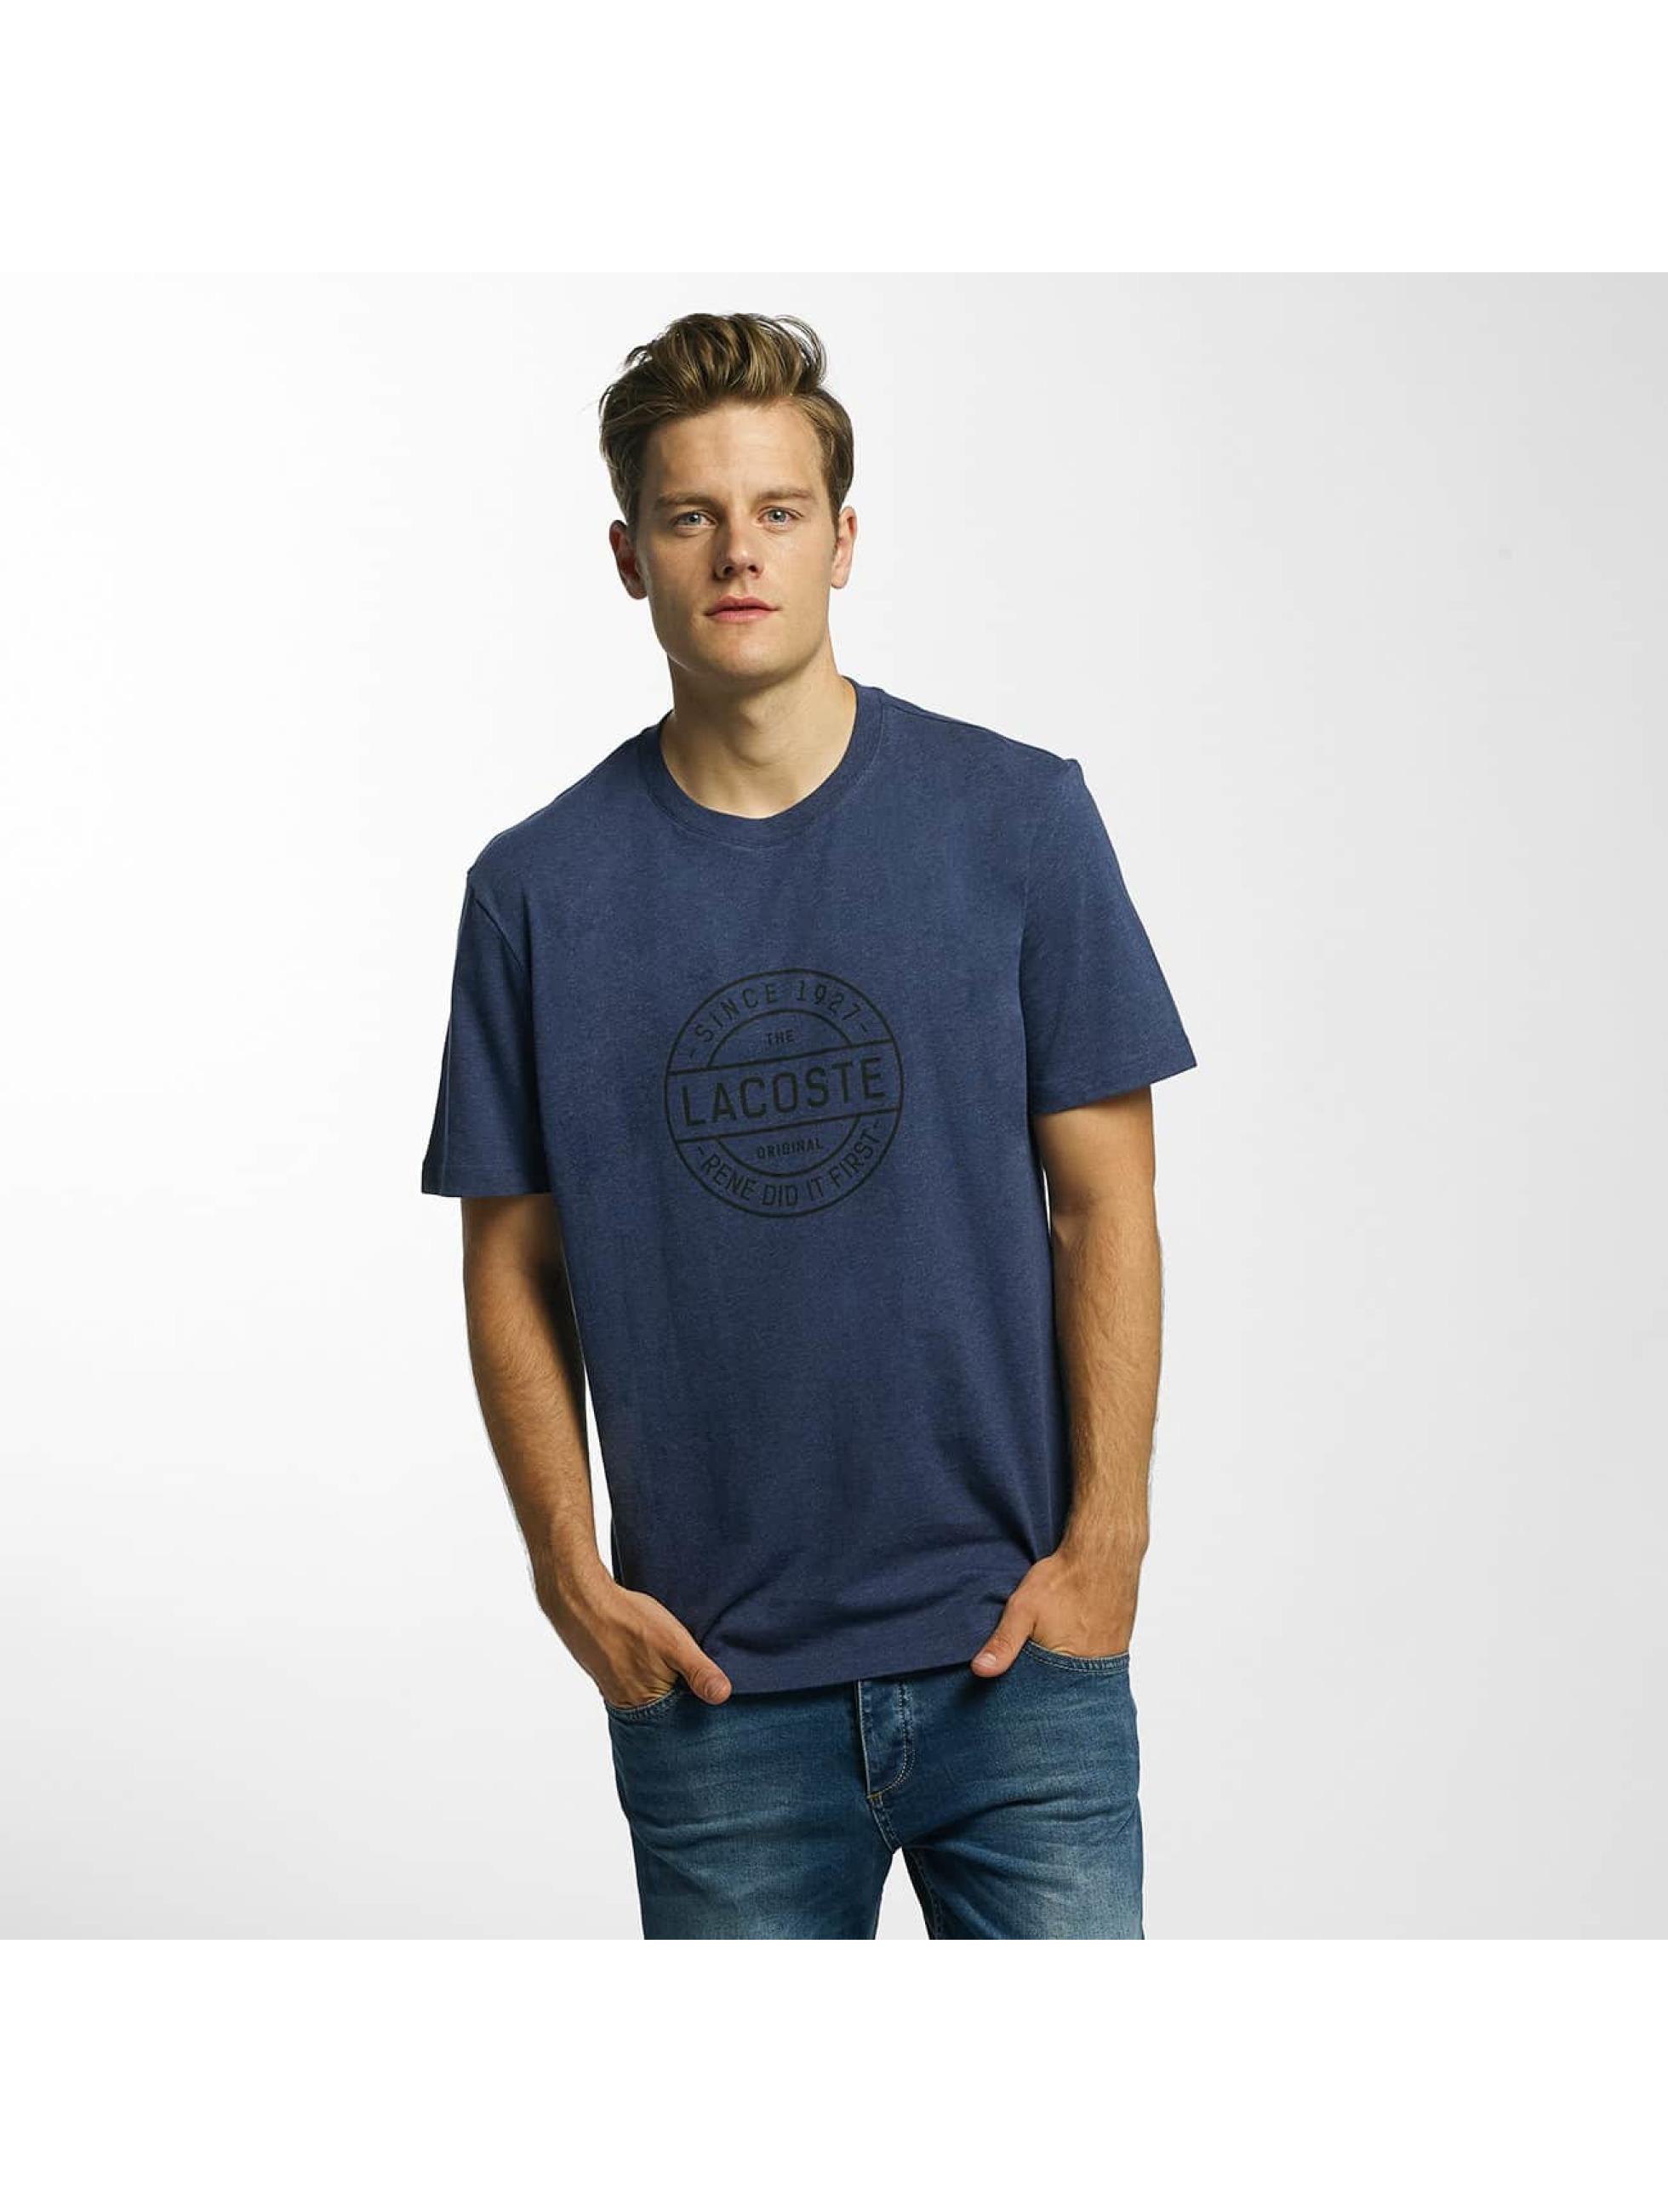 Lacoste Classic T-Shirt Original blue